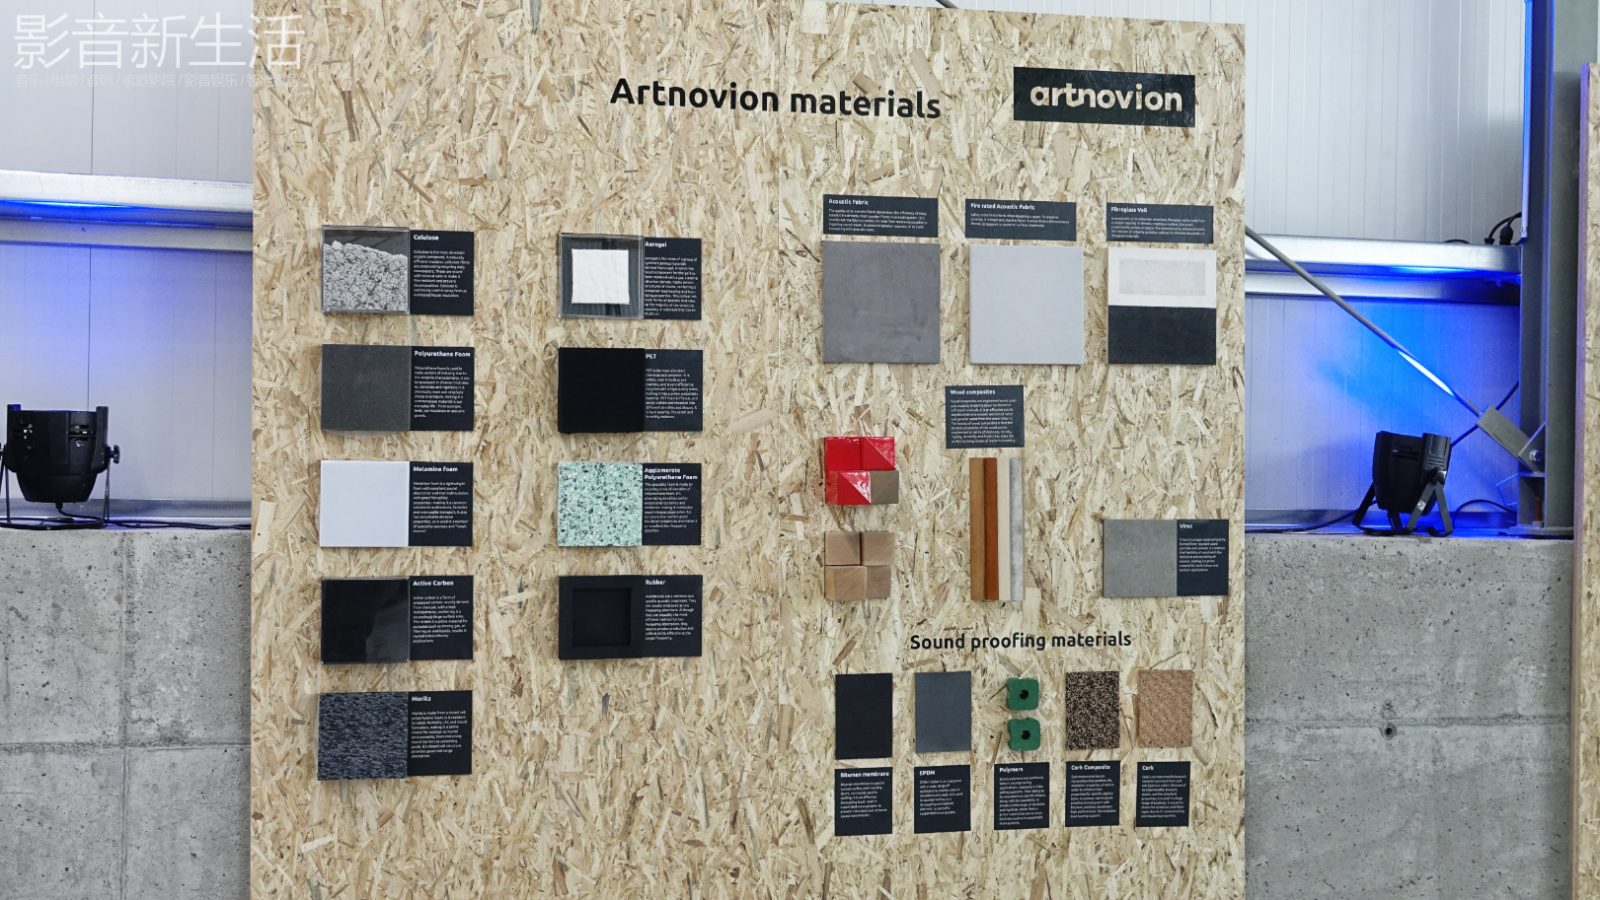 artnovion trip 16 - 回顾 | 葡萄牙声学品牌Artnovion(雅乐之音)全新总部落成!众多新品与在线设计服务同时发布!